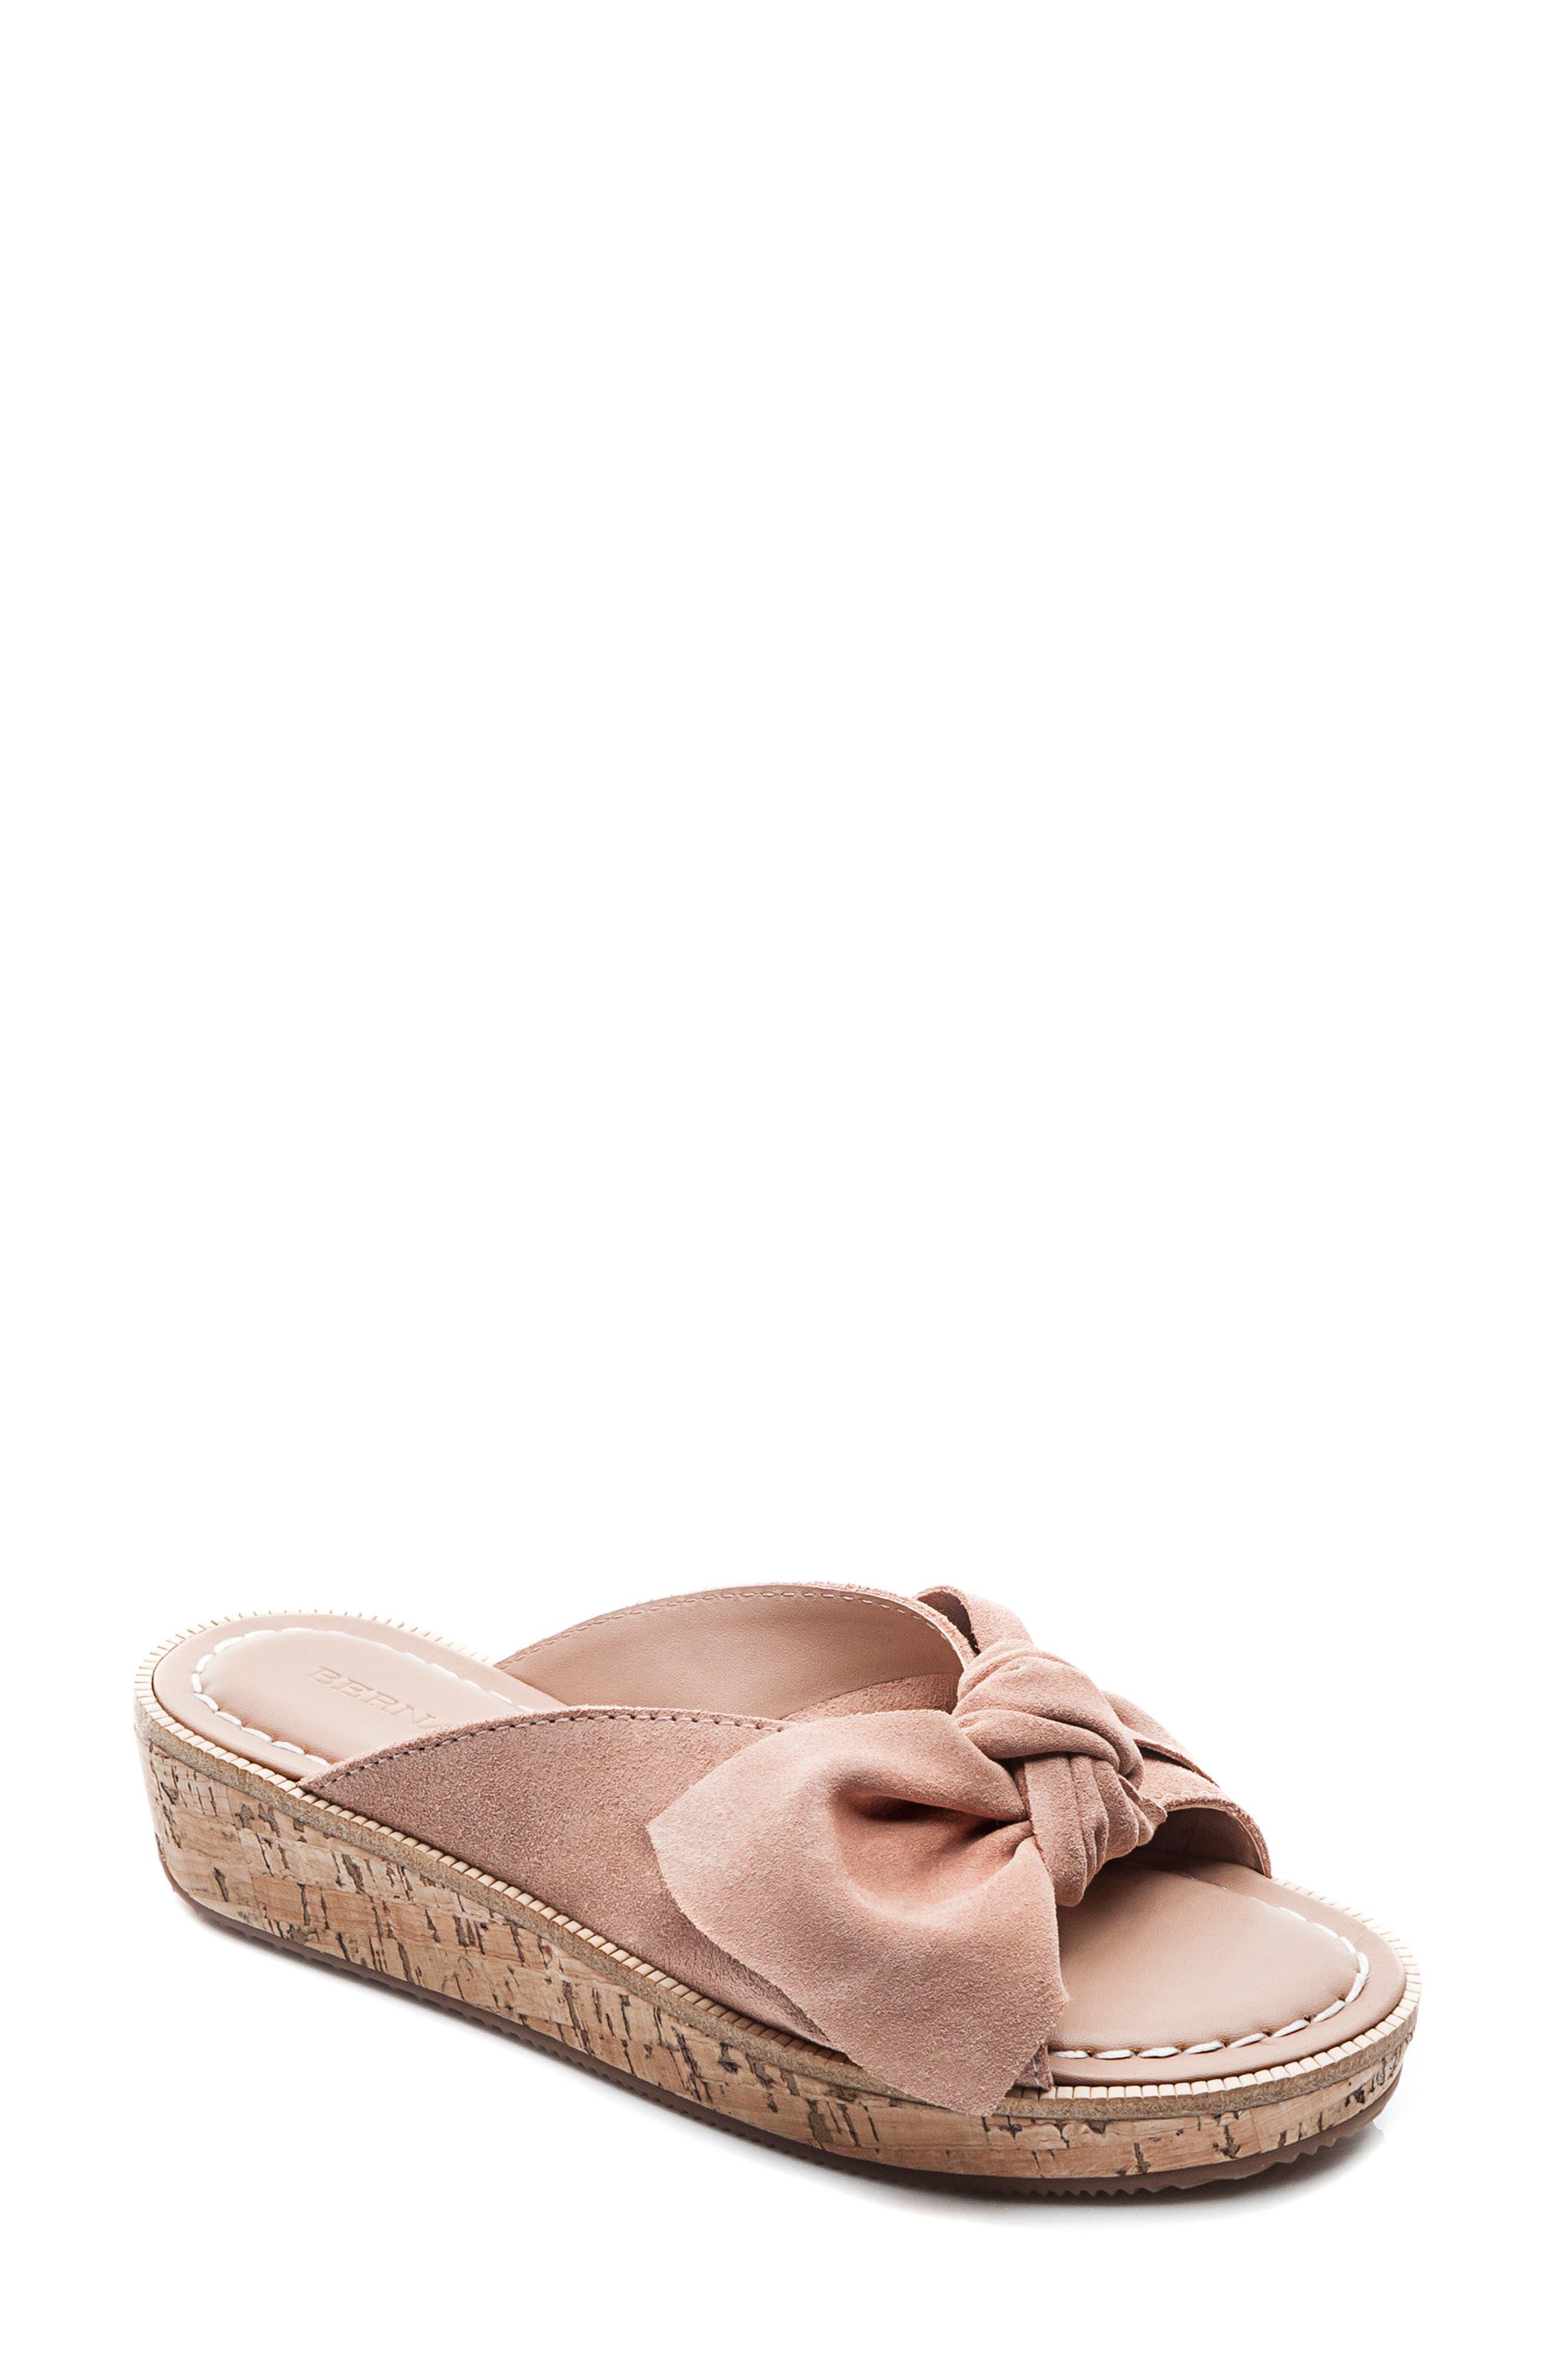 Bernardo Petra Slide Sandal,                         Main,                         color, Blush Leather